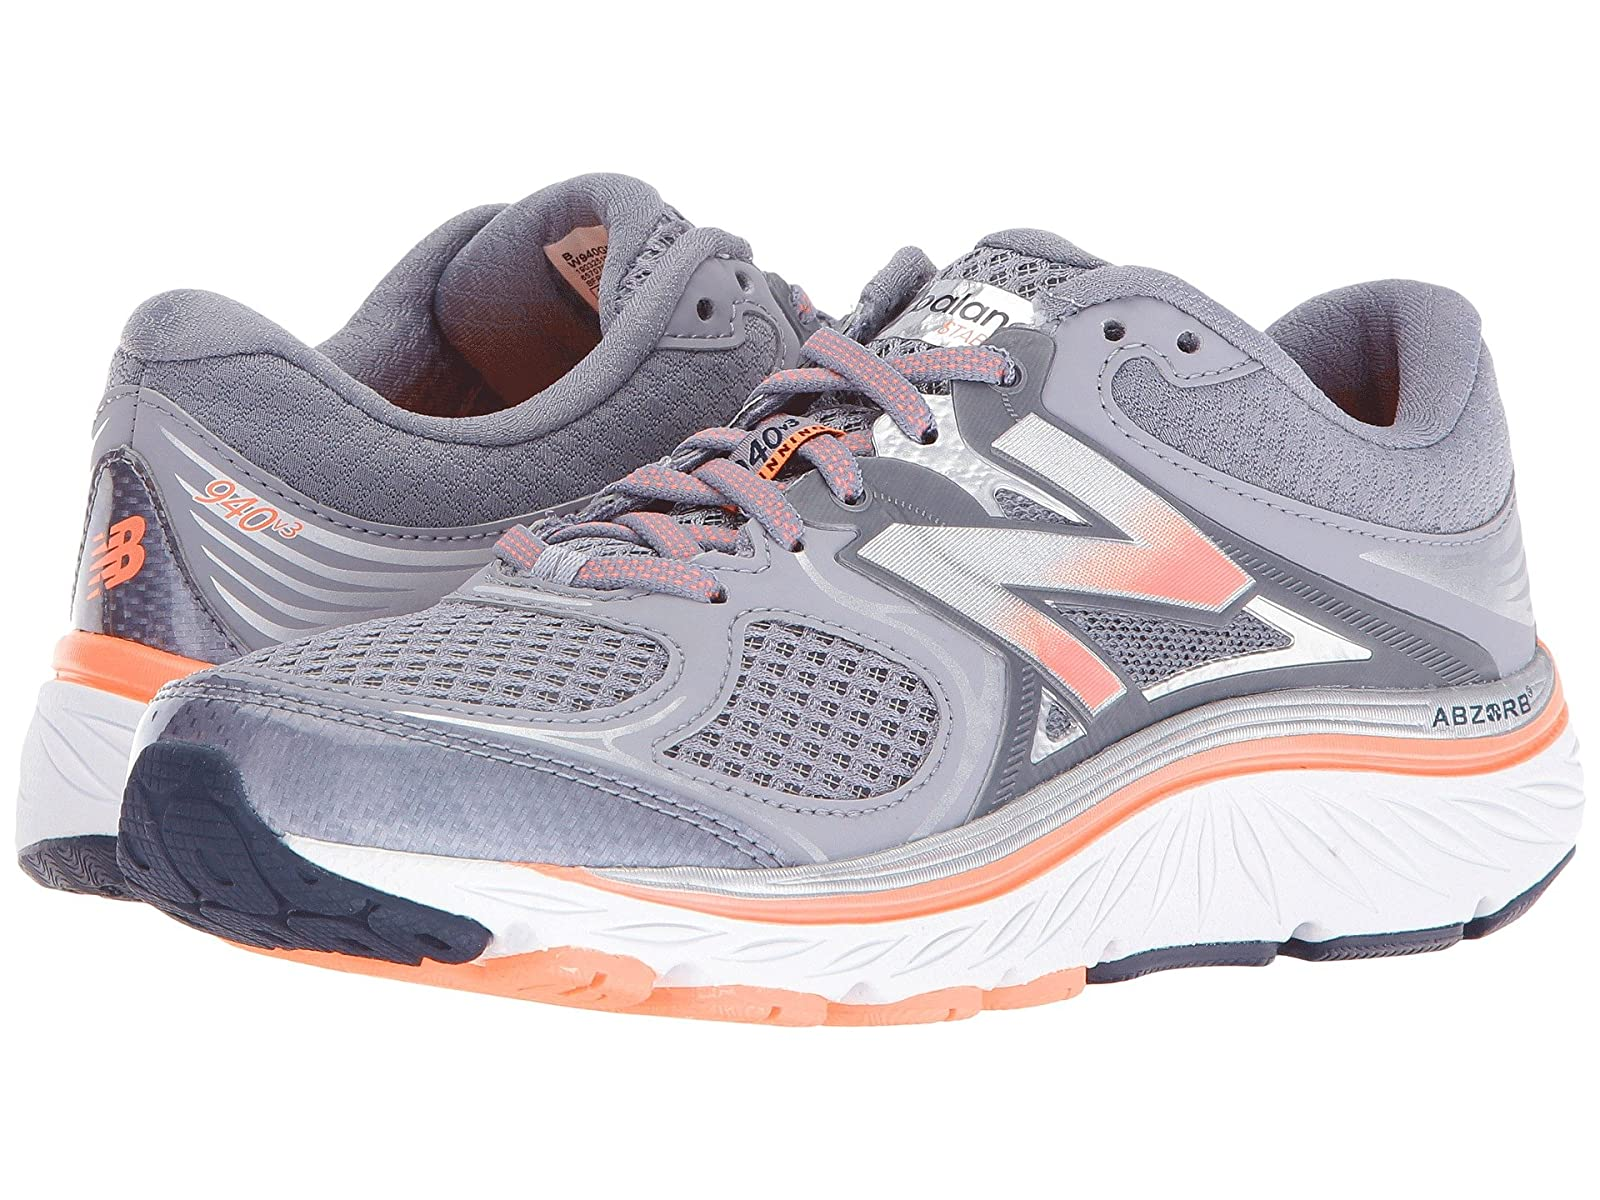 New Balance W940v3Atmospheric grades have affordable shoes